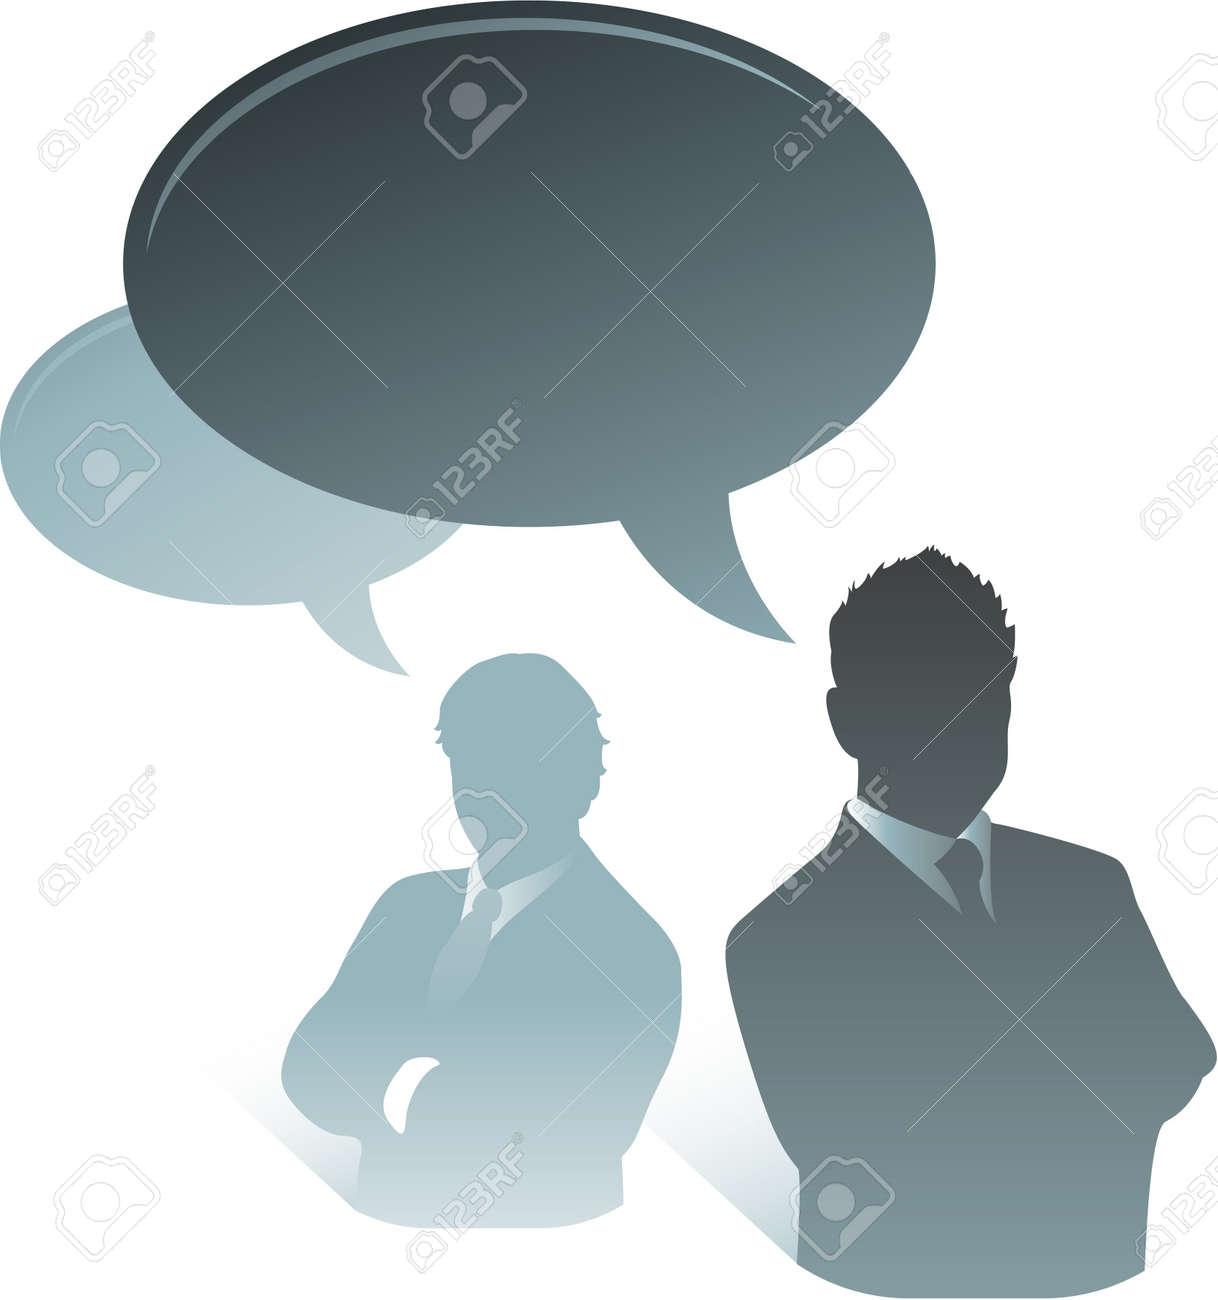 business communication talking bubbles Stock Vector - 8692975